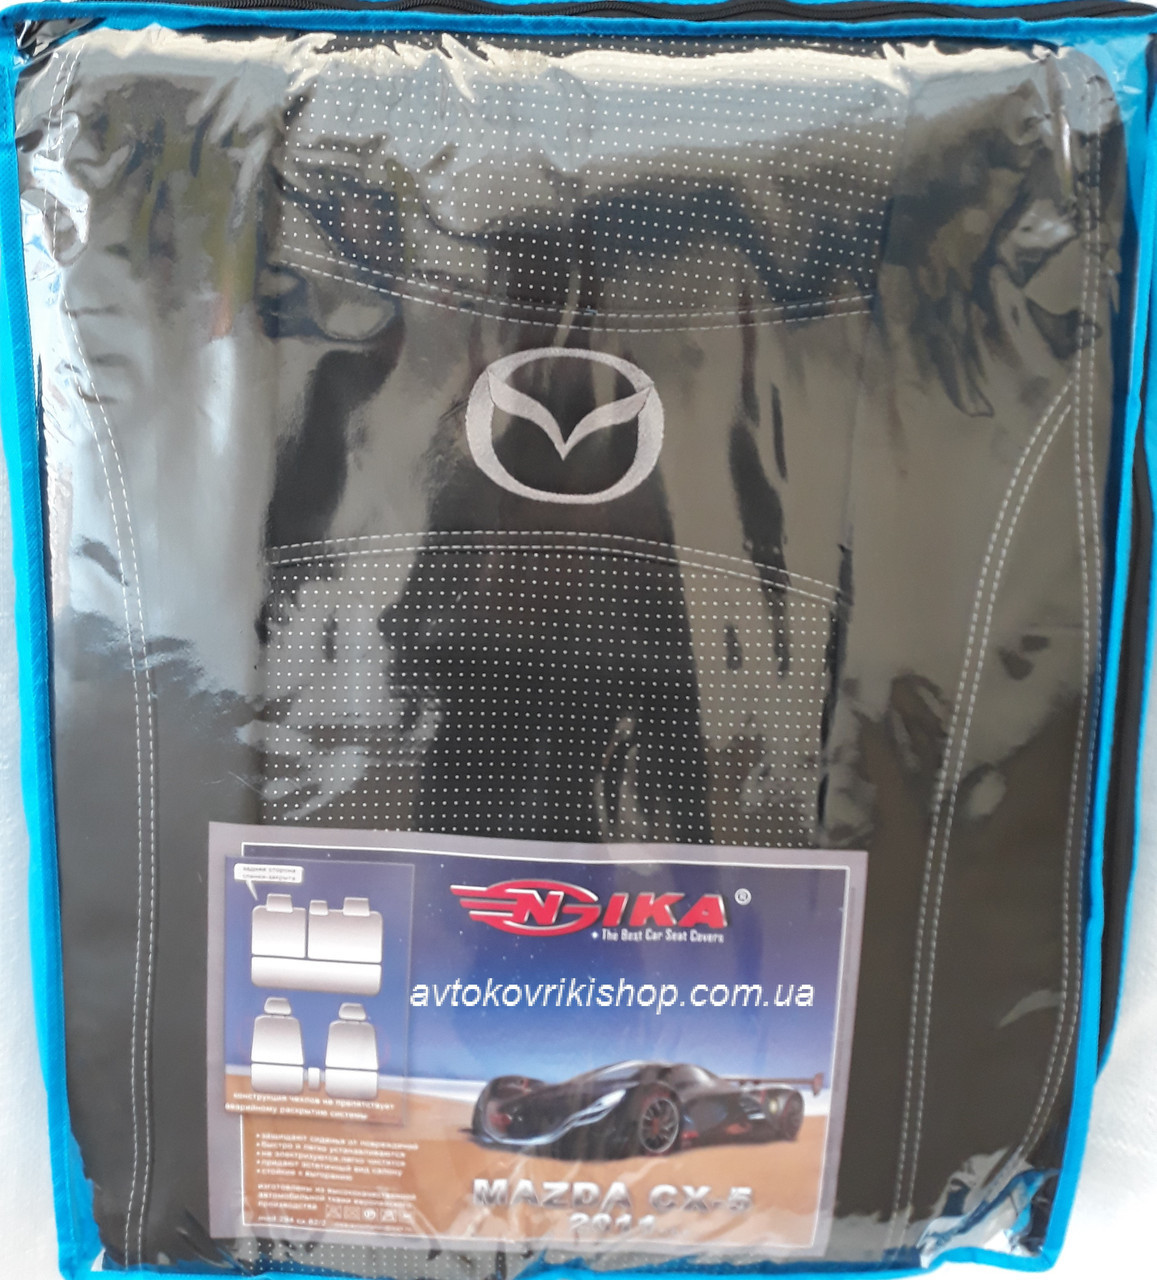 Авточехлы Mazda CX-5 2011-2017 Nika